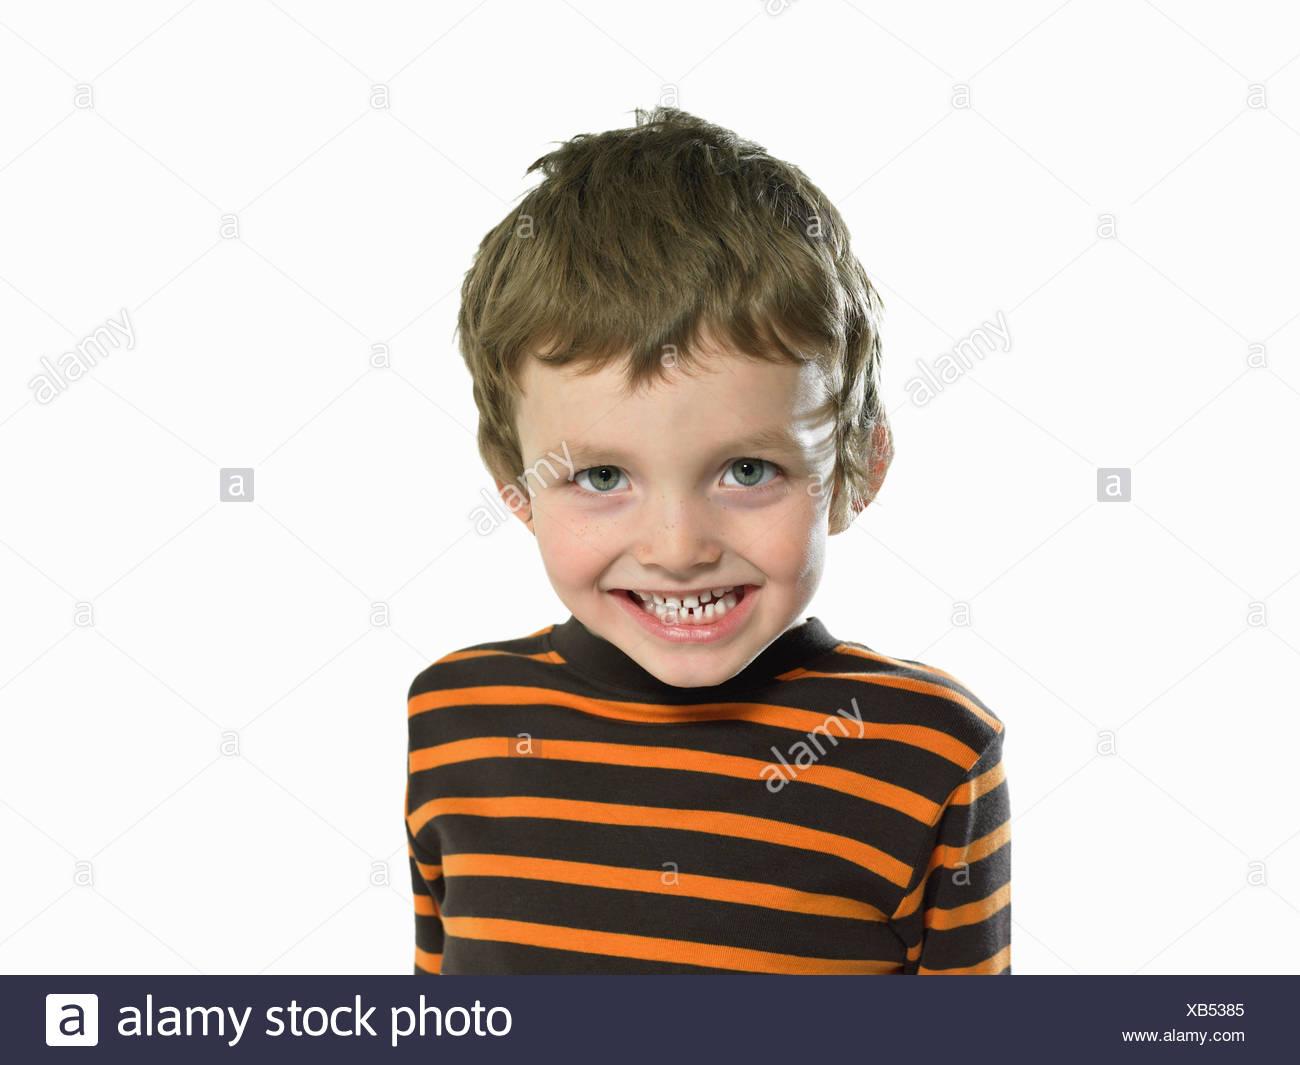 Cheeky looking boy - Stock Image